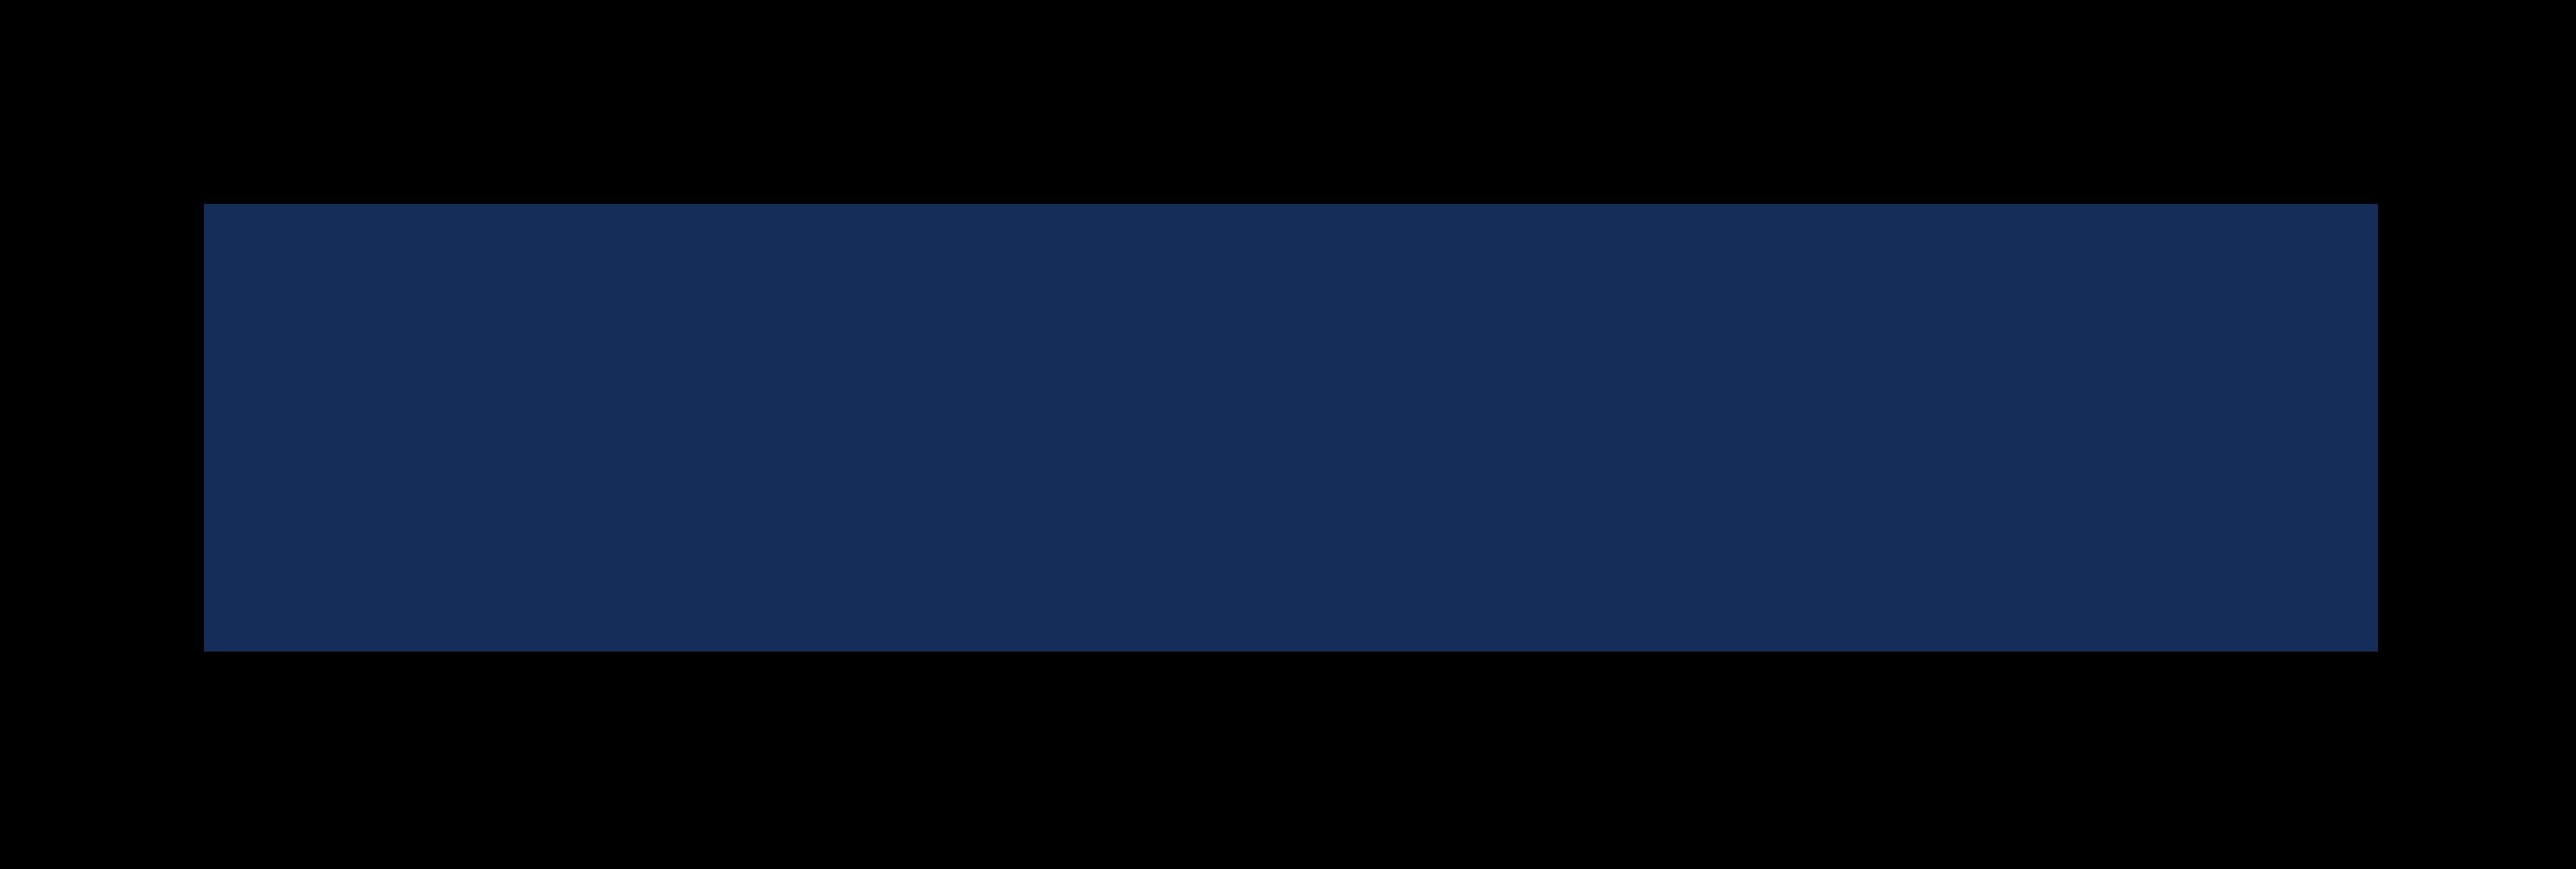 Shane Leichty - Piatt Sotheby's